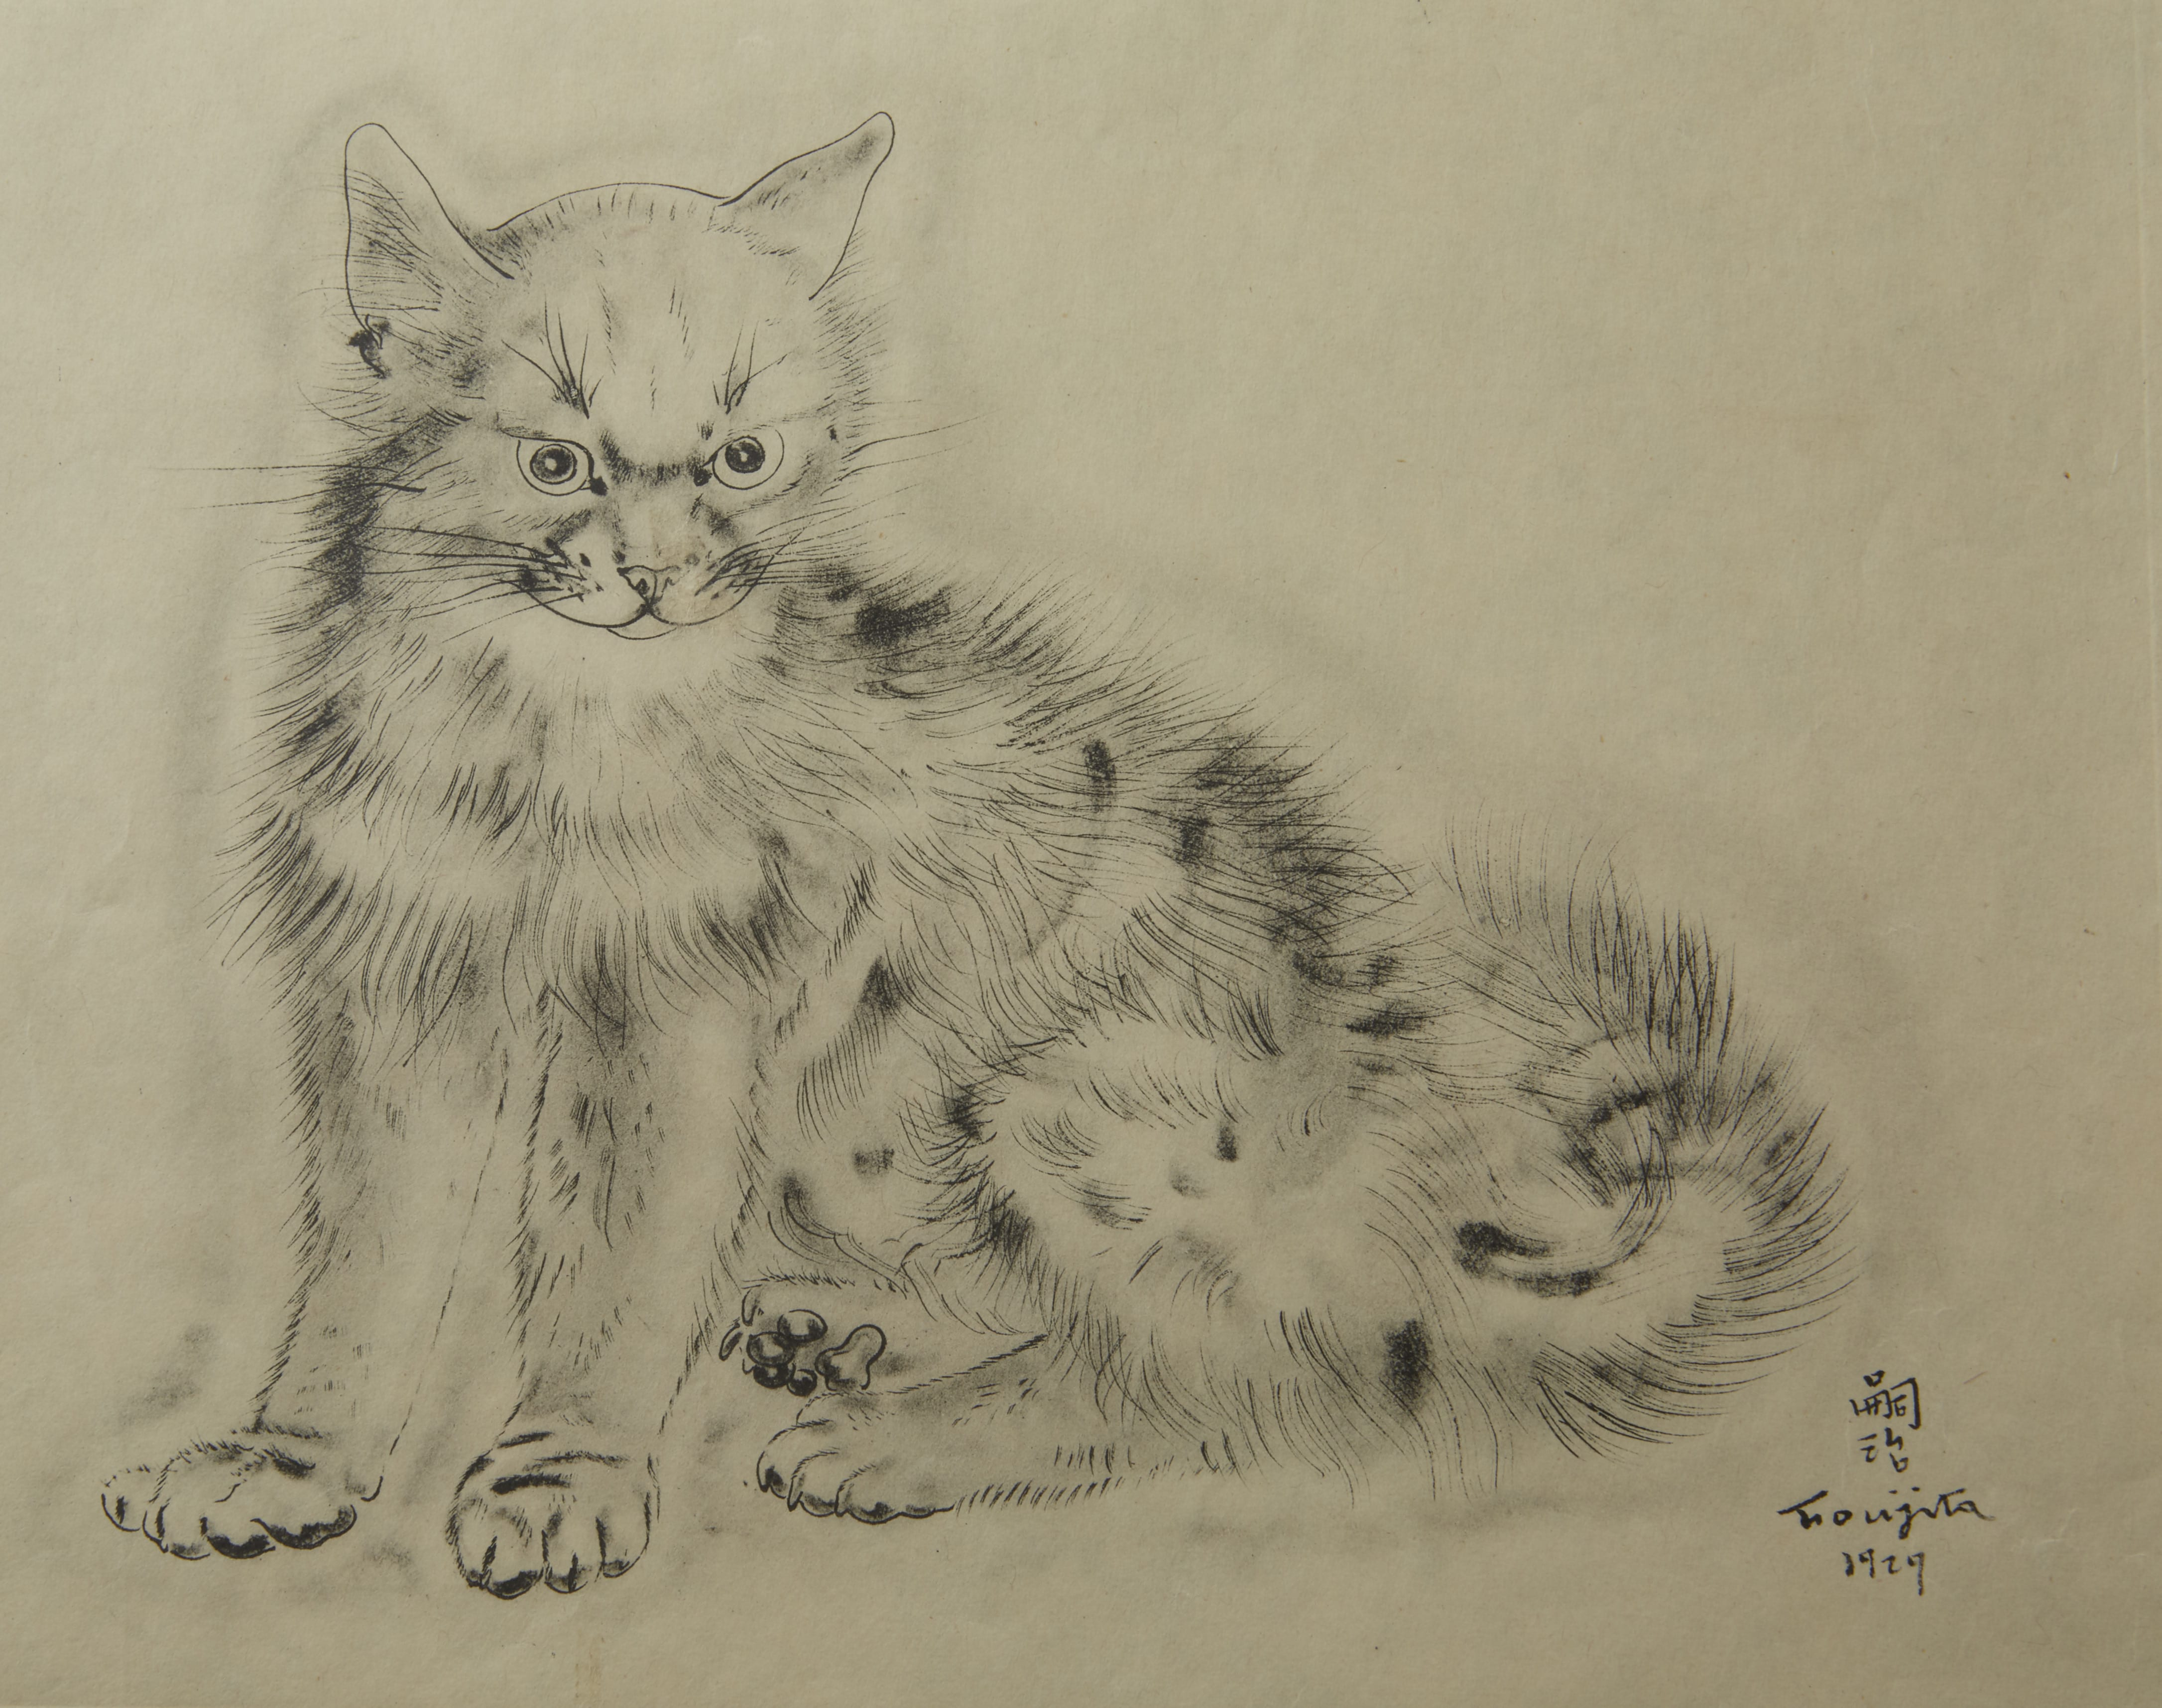 Lot 259: Leonard Tsuguharu Foujita Collotype Print Book of Cats